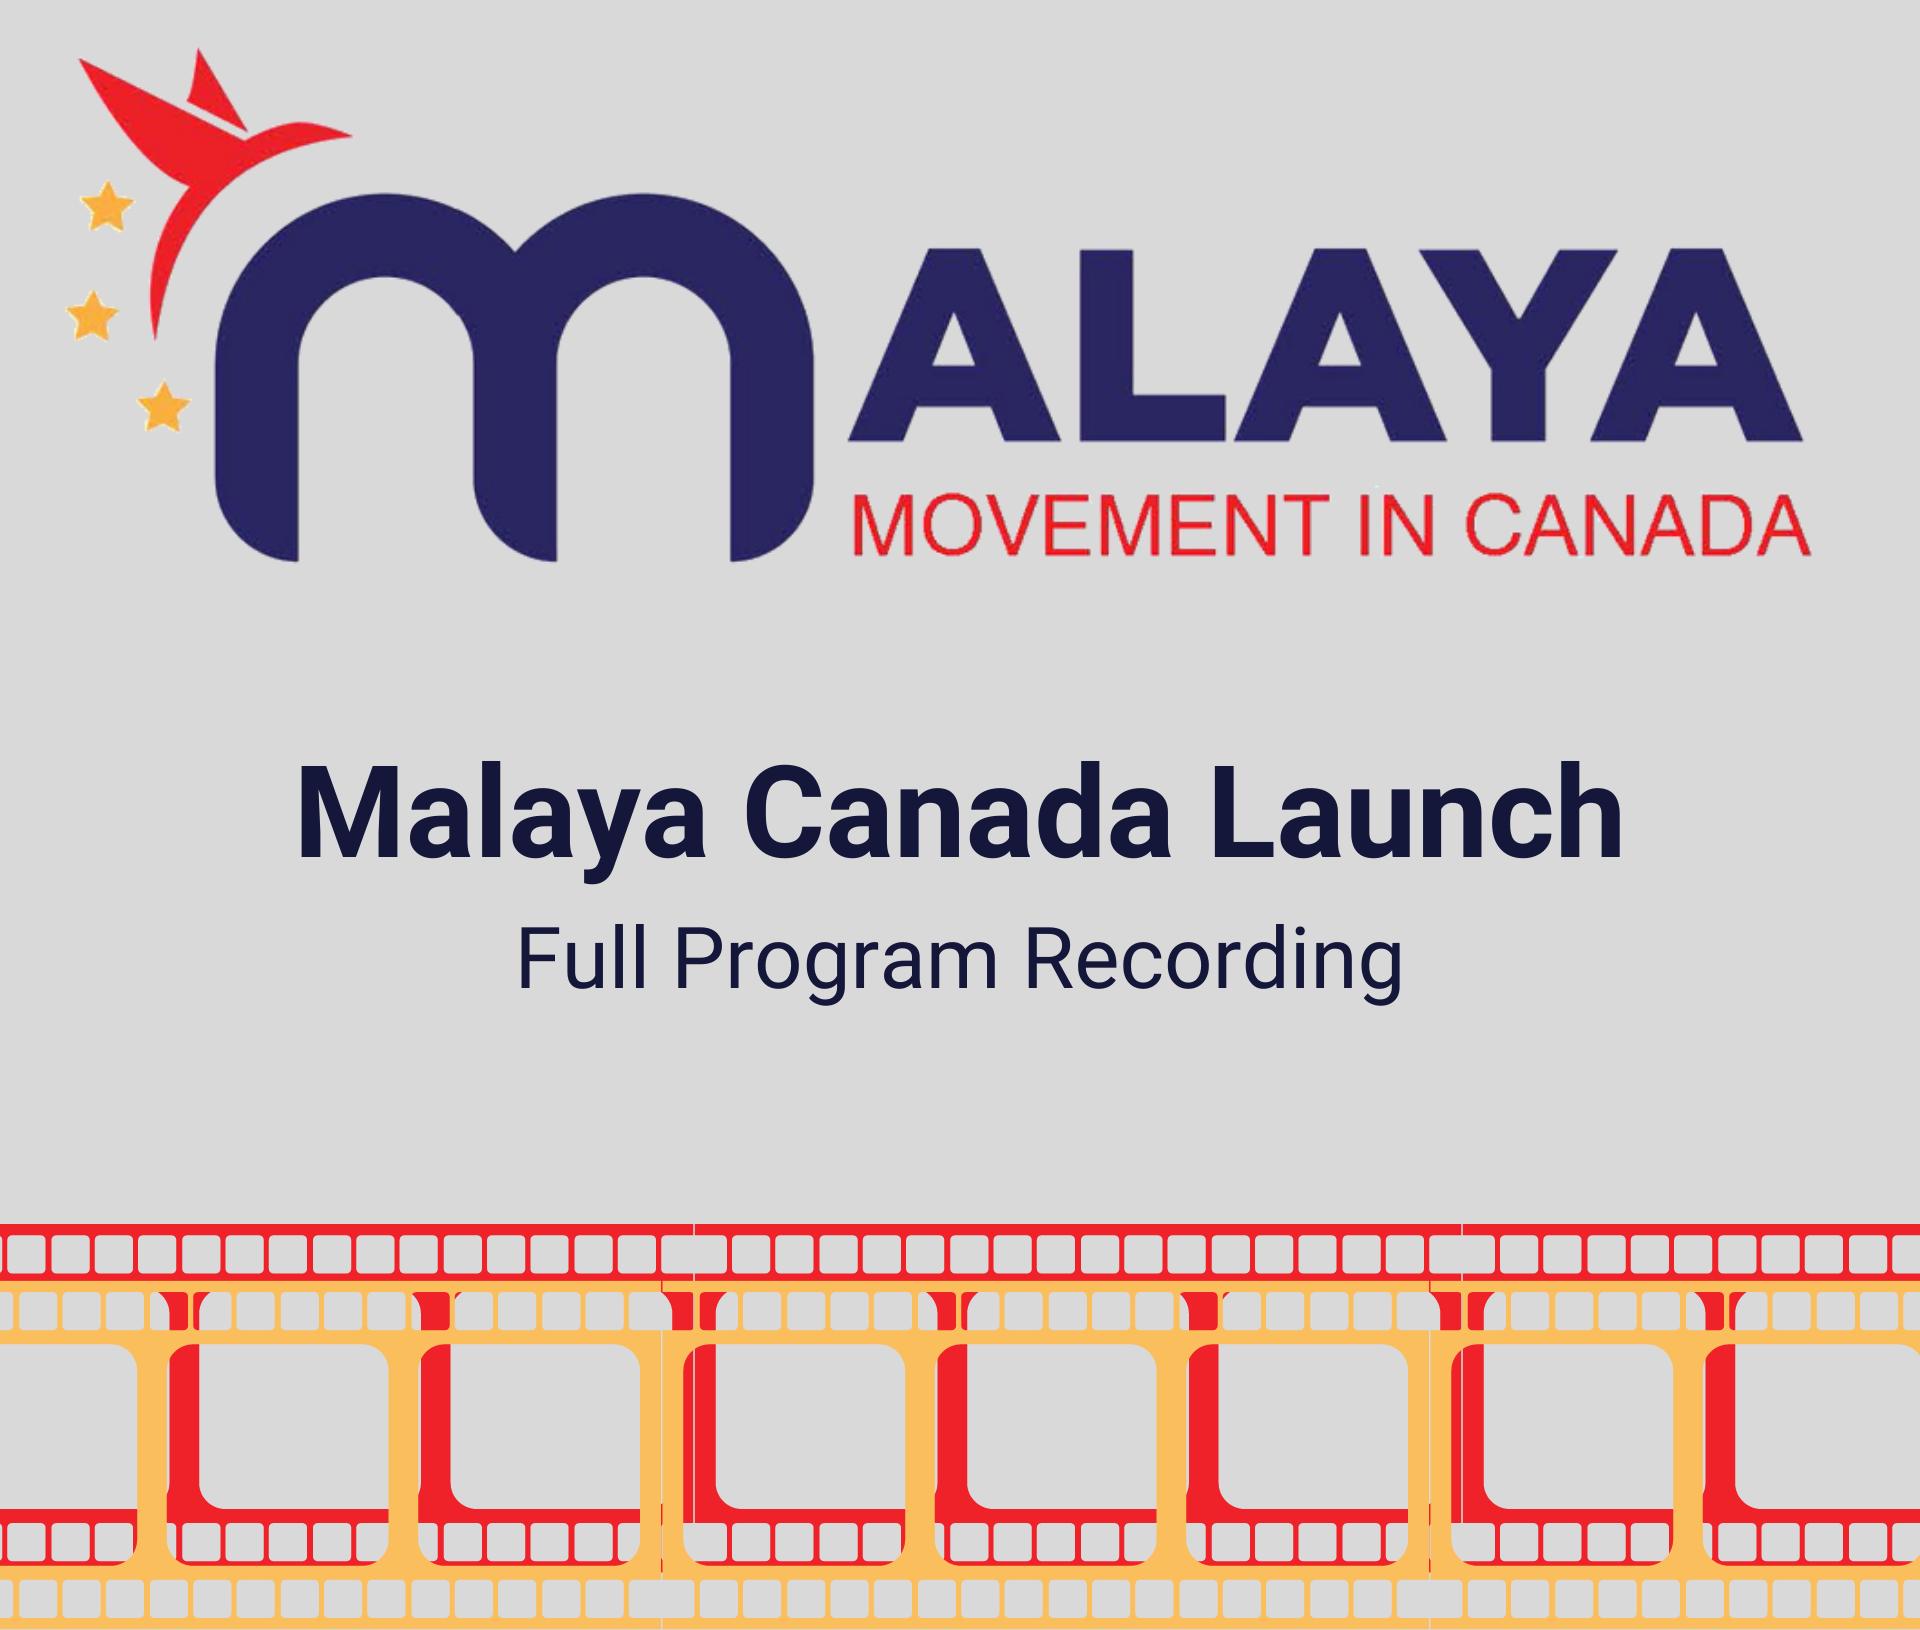 Malaya Canada Launch video